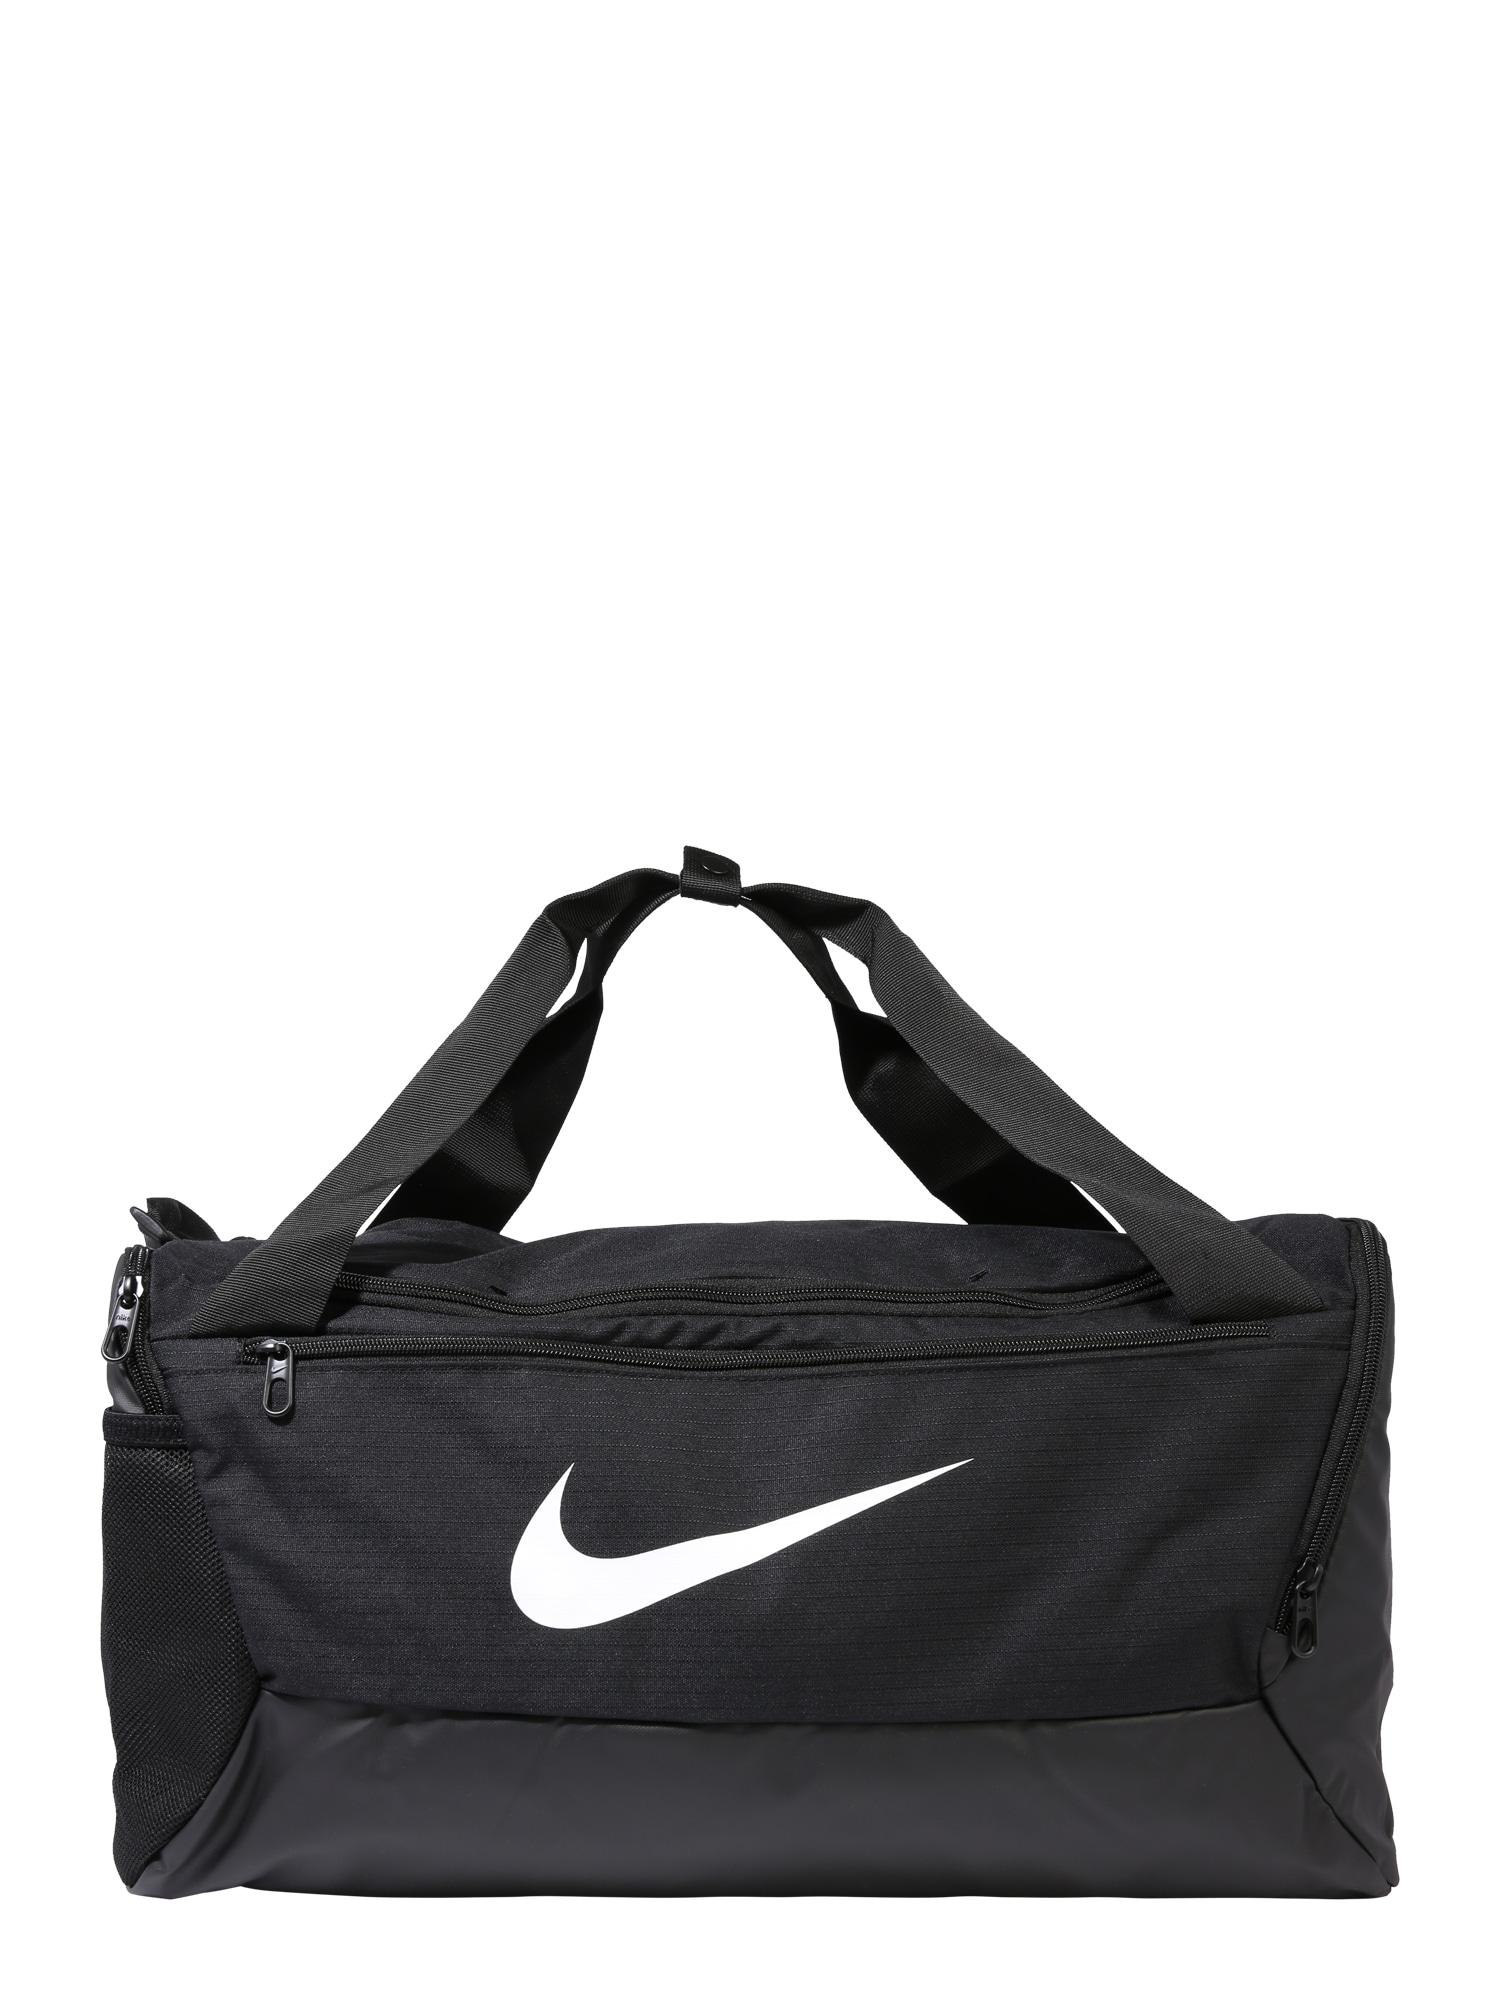 NIKE Sportinis krepšys 'BRSLA S DUFF - 9.0' balta / juoda